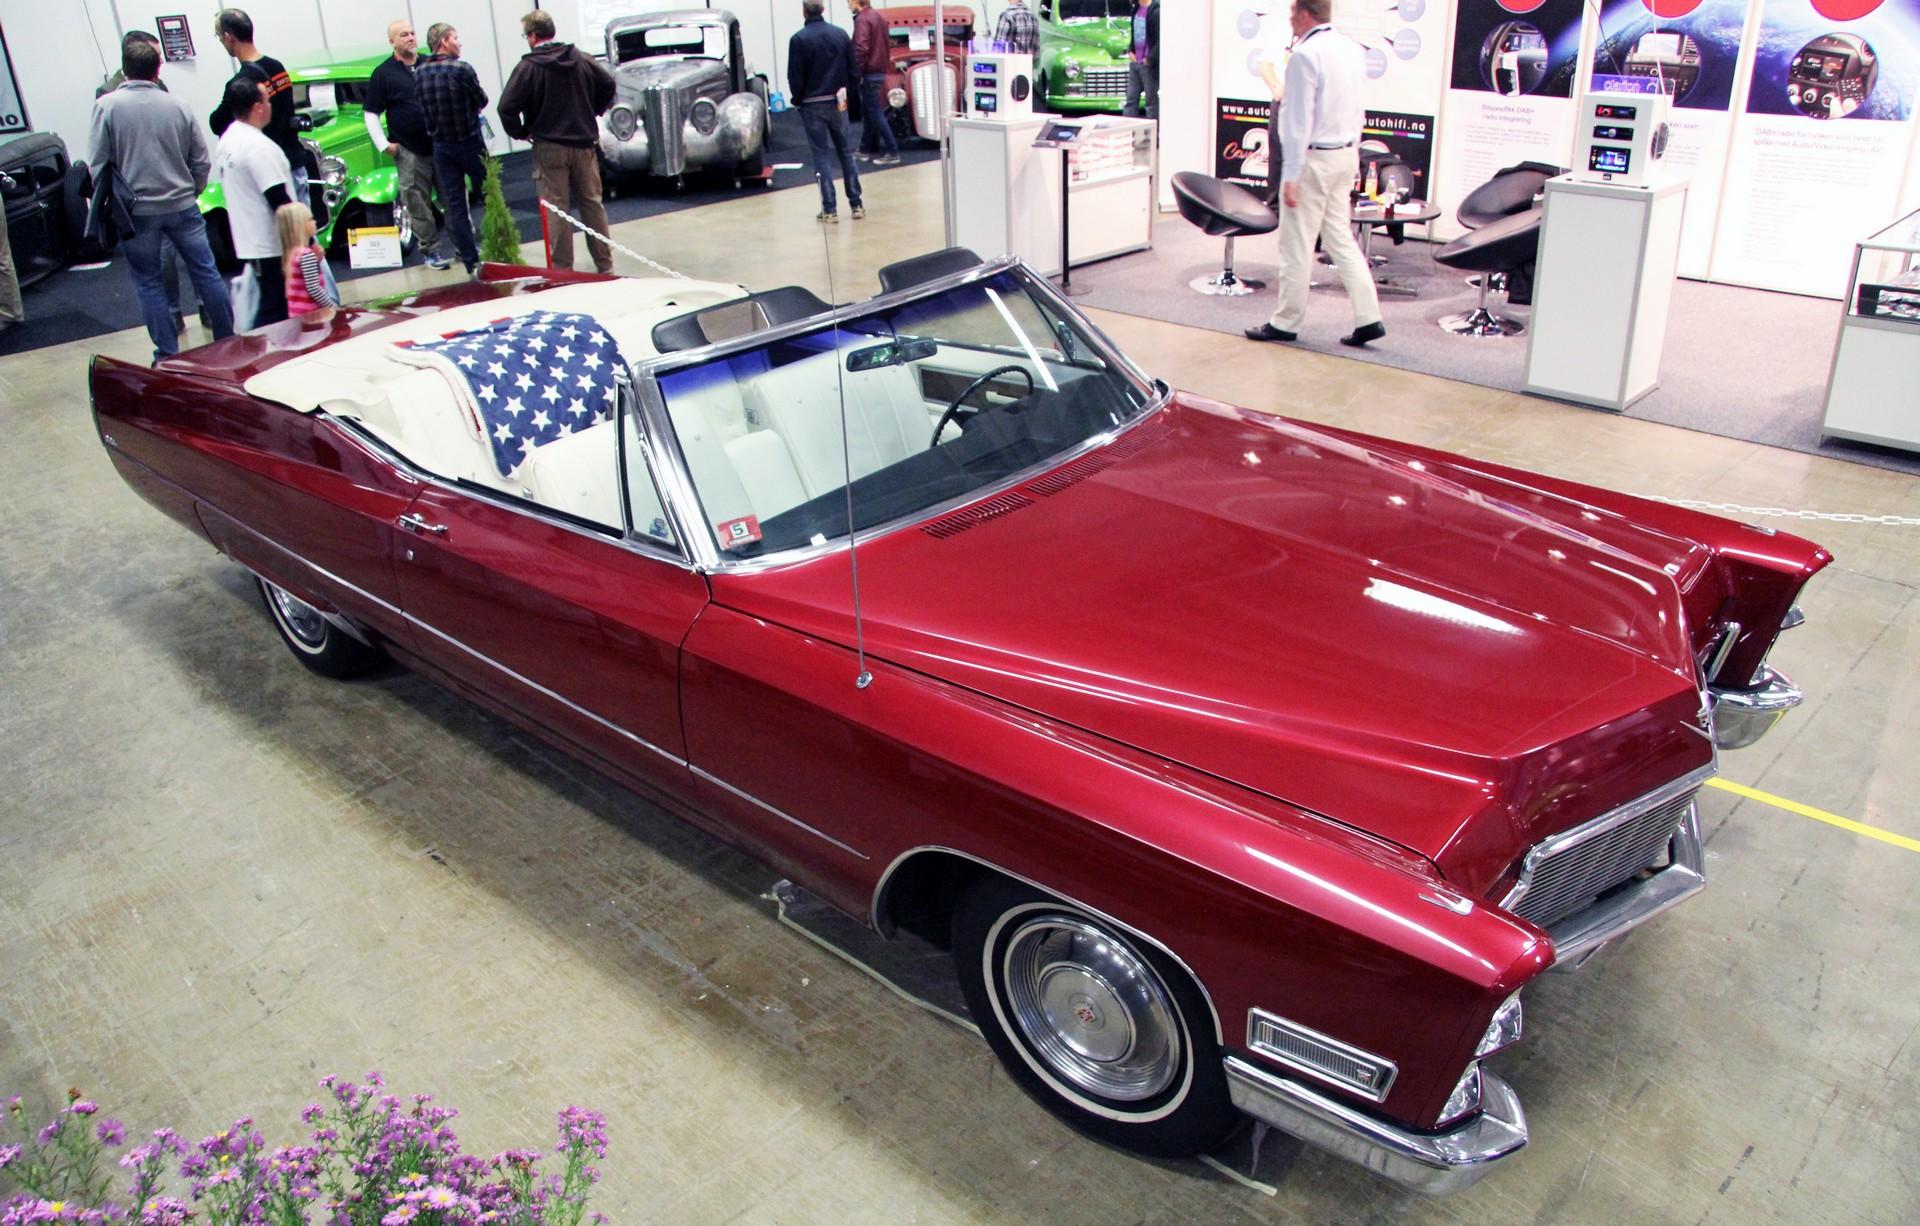 075-1968 Cadillac DeVille convertible 01. Eier- me